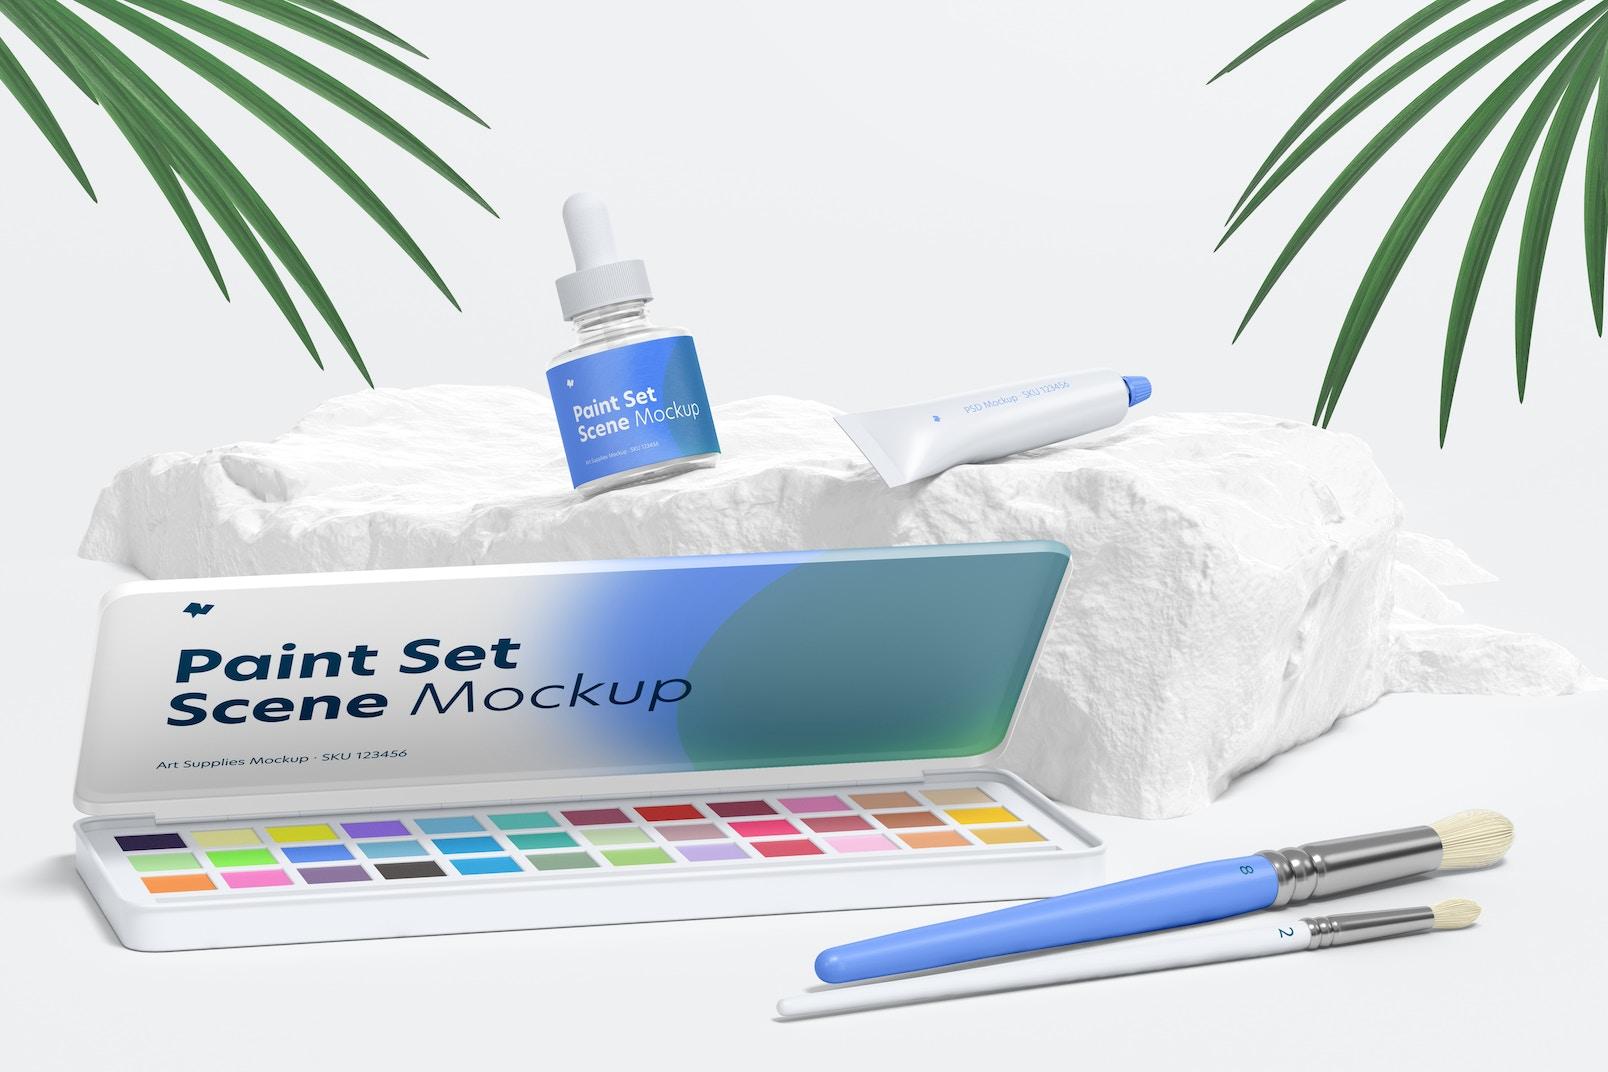 Paint Set Scene Mockup, Front View